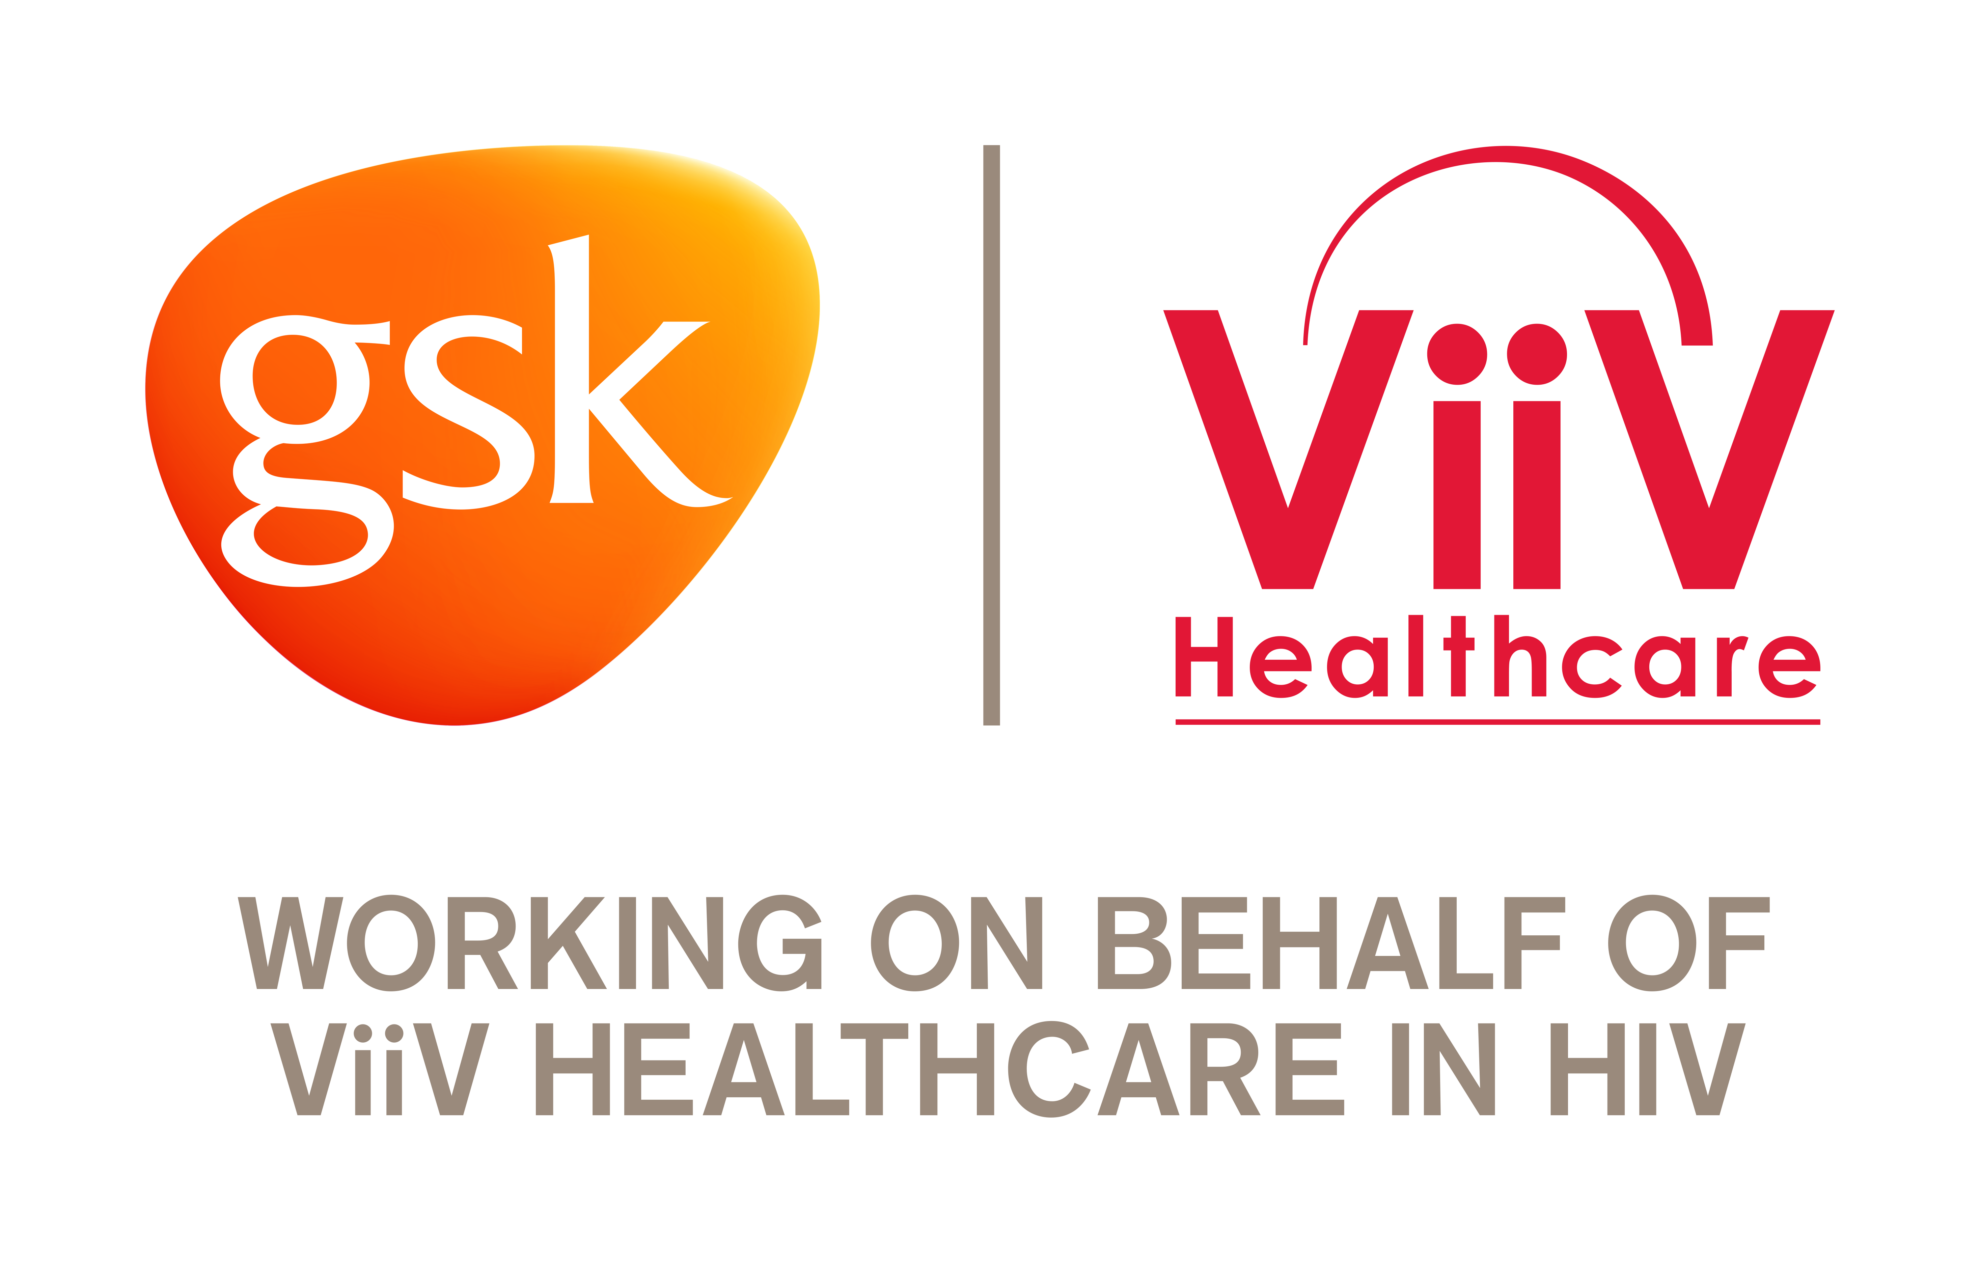 GSK - Case Study - Markettiers - broadcast specialist creative agency